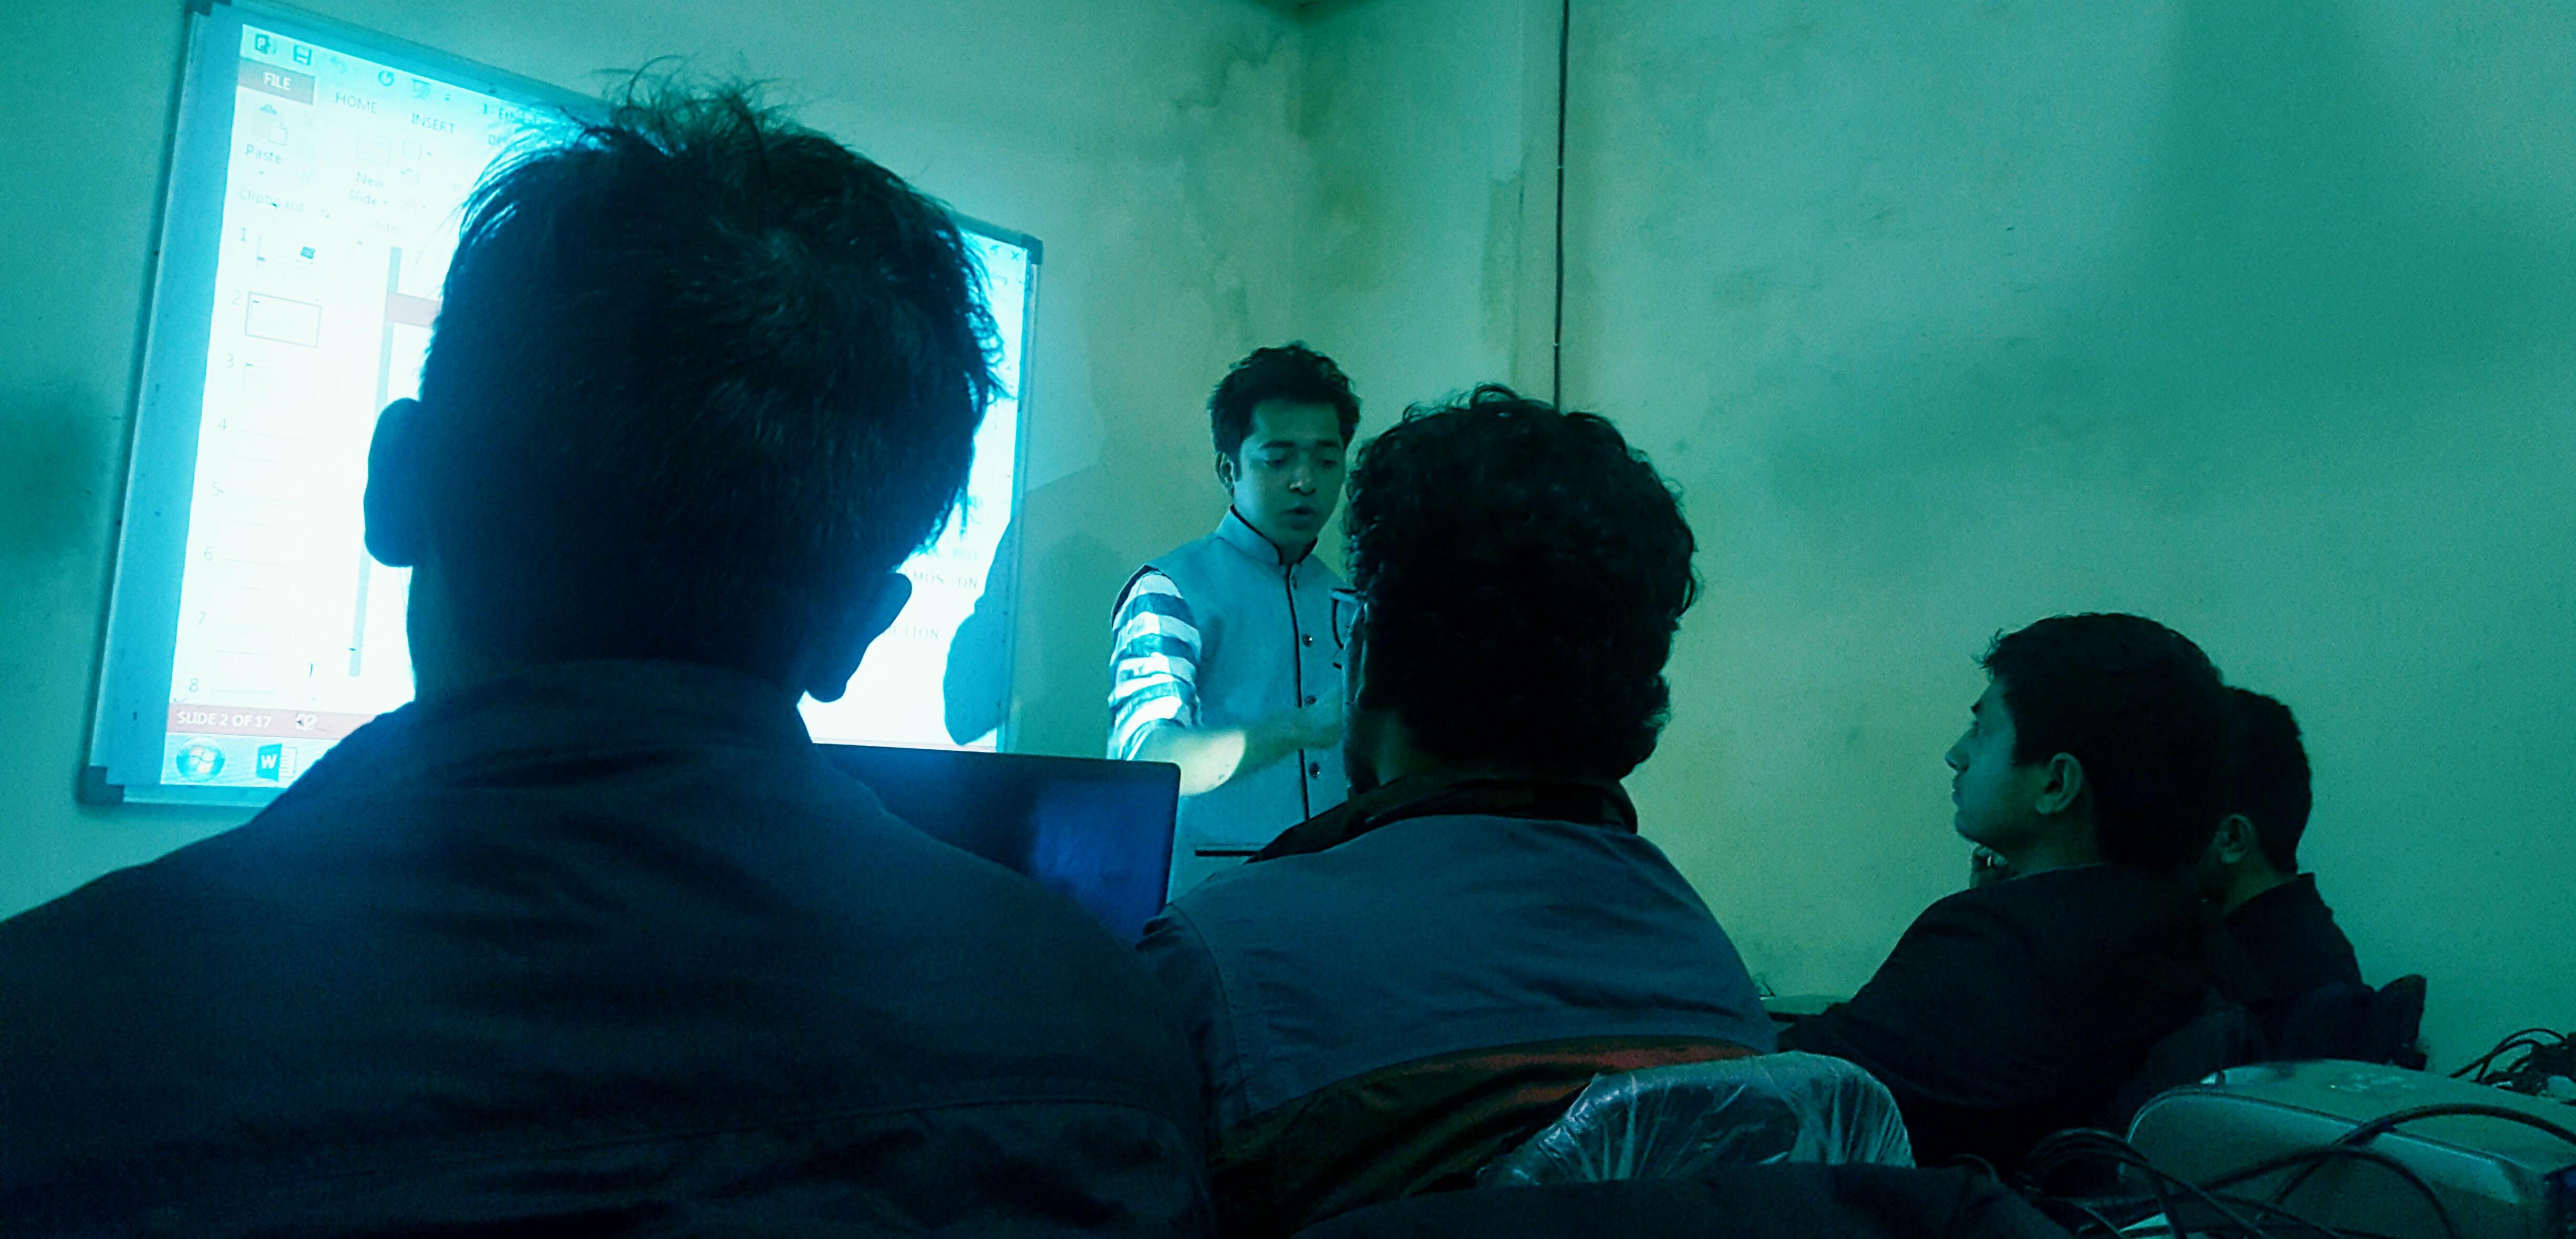 Ethical Hacking Workshop pokhara nepal 2017 bijay acharya 1.jpg